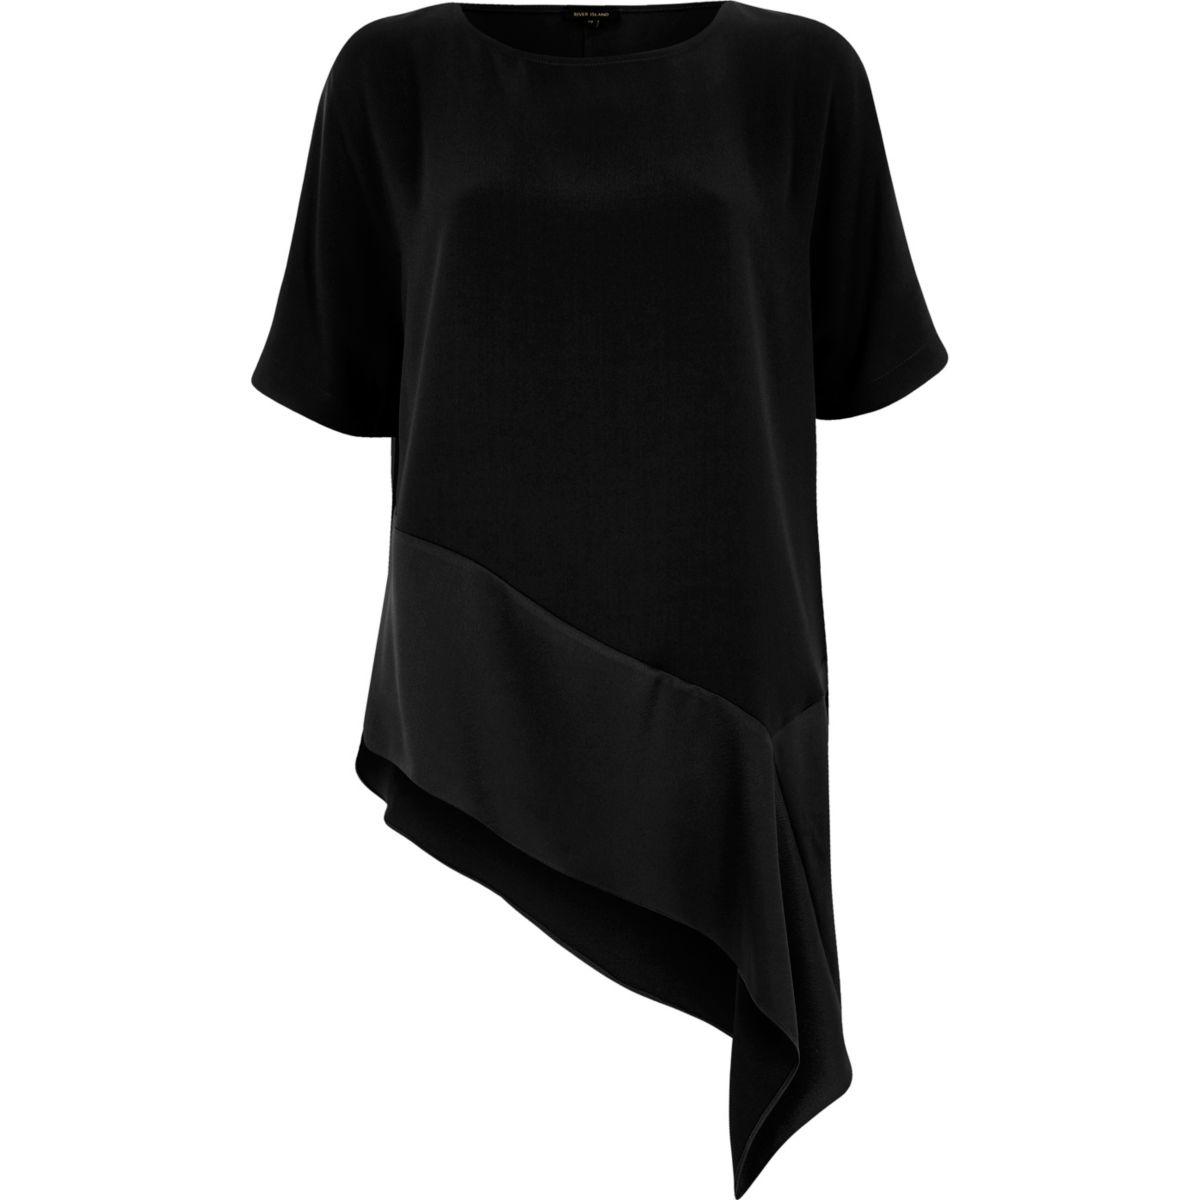 Black asymmetric hem T-shirt